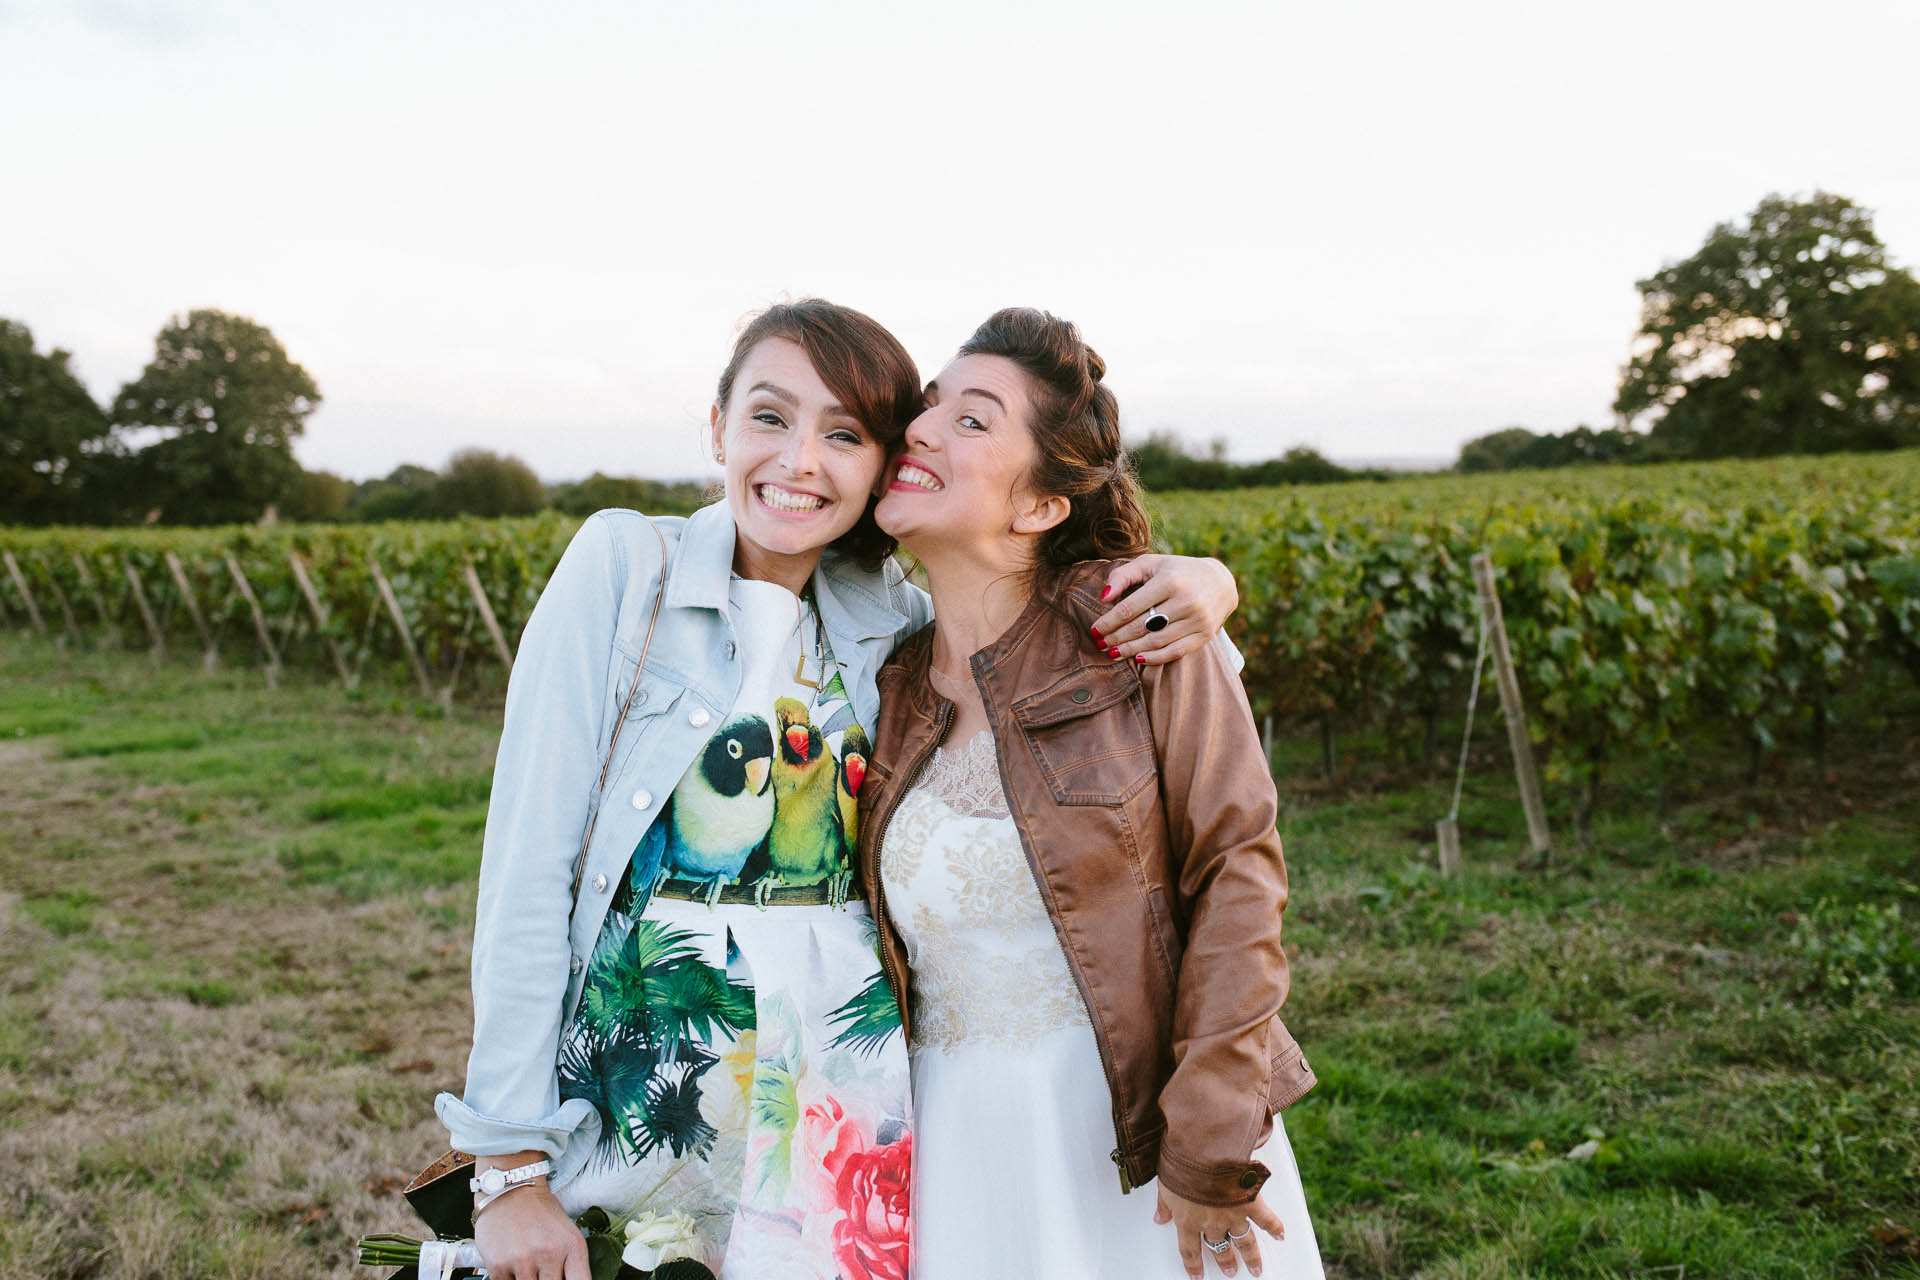 mariage_vignobles_mourat_vendee_jeremy_agathe_flavie_nelly-524